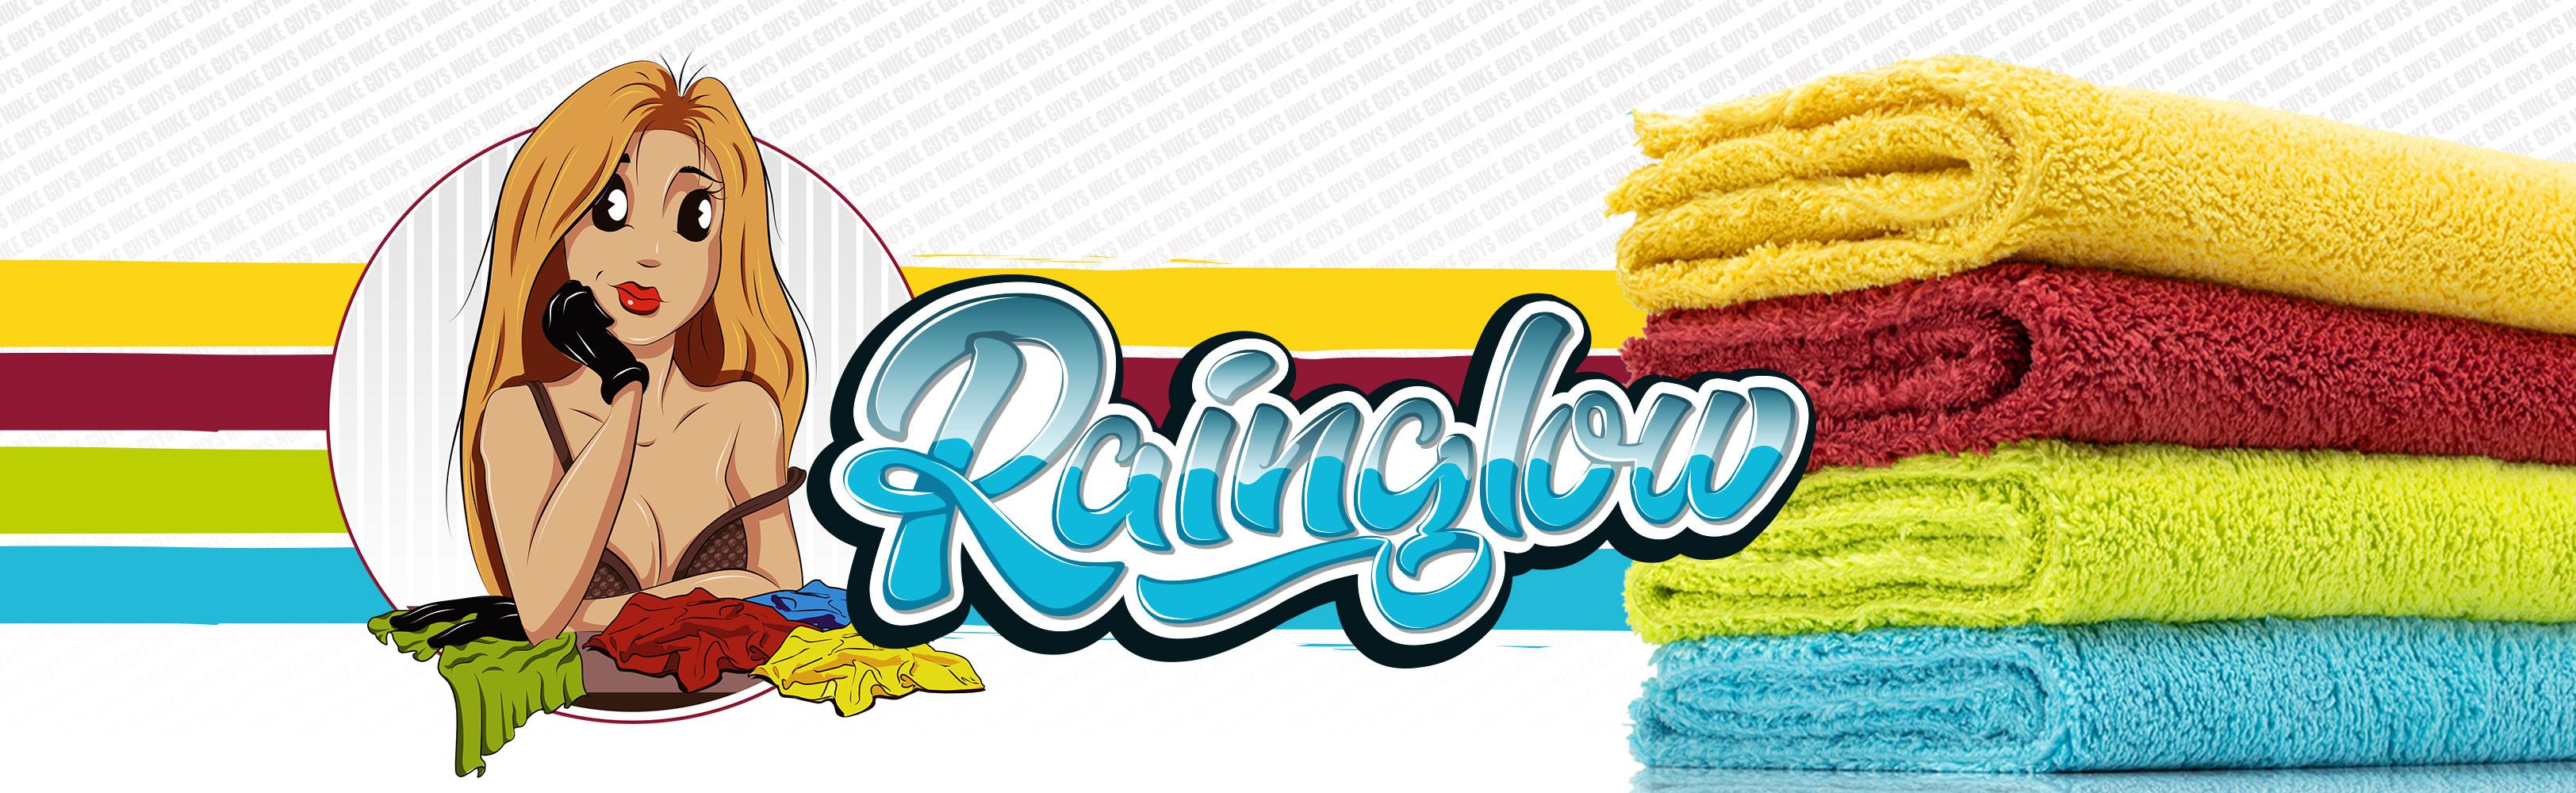 Rainglow